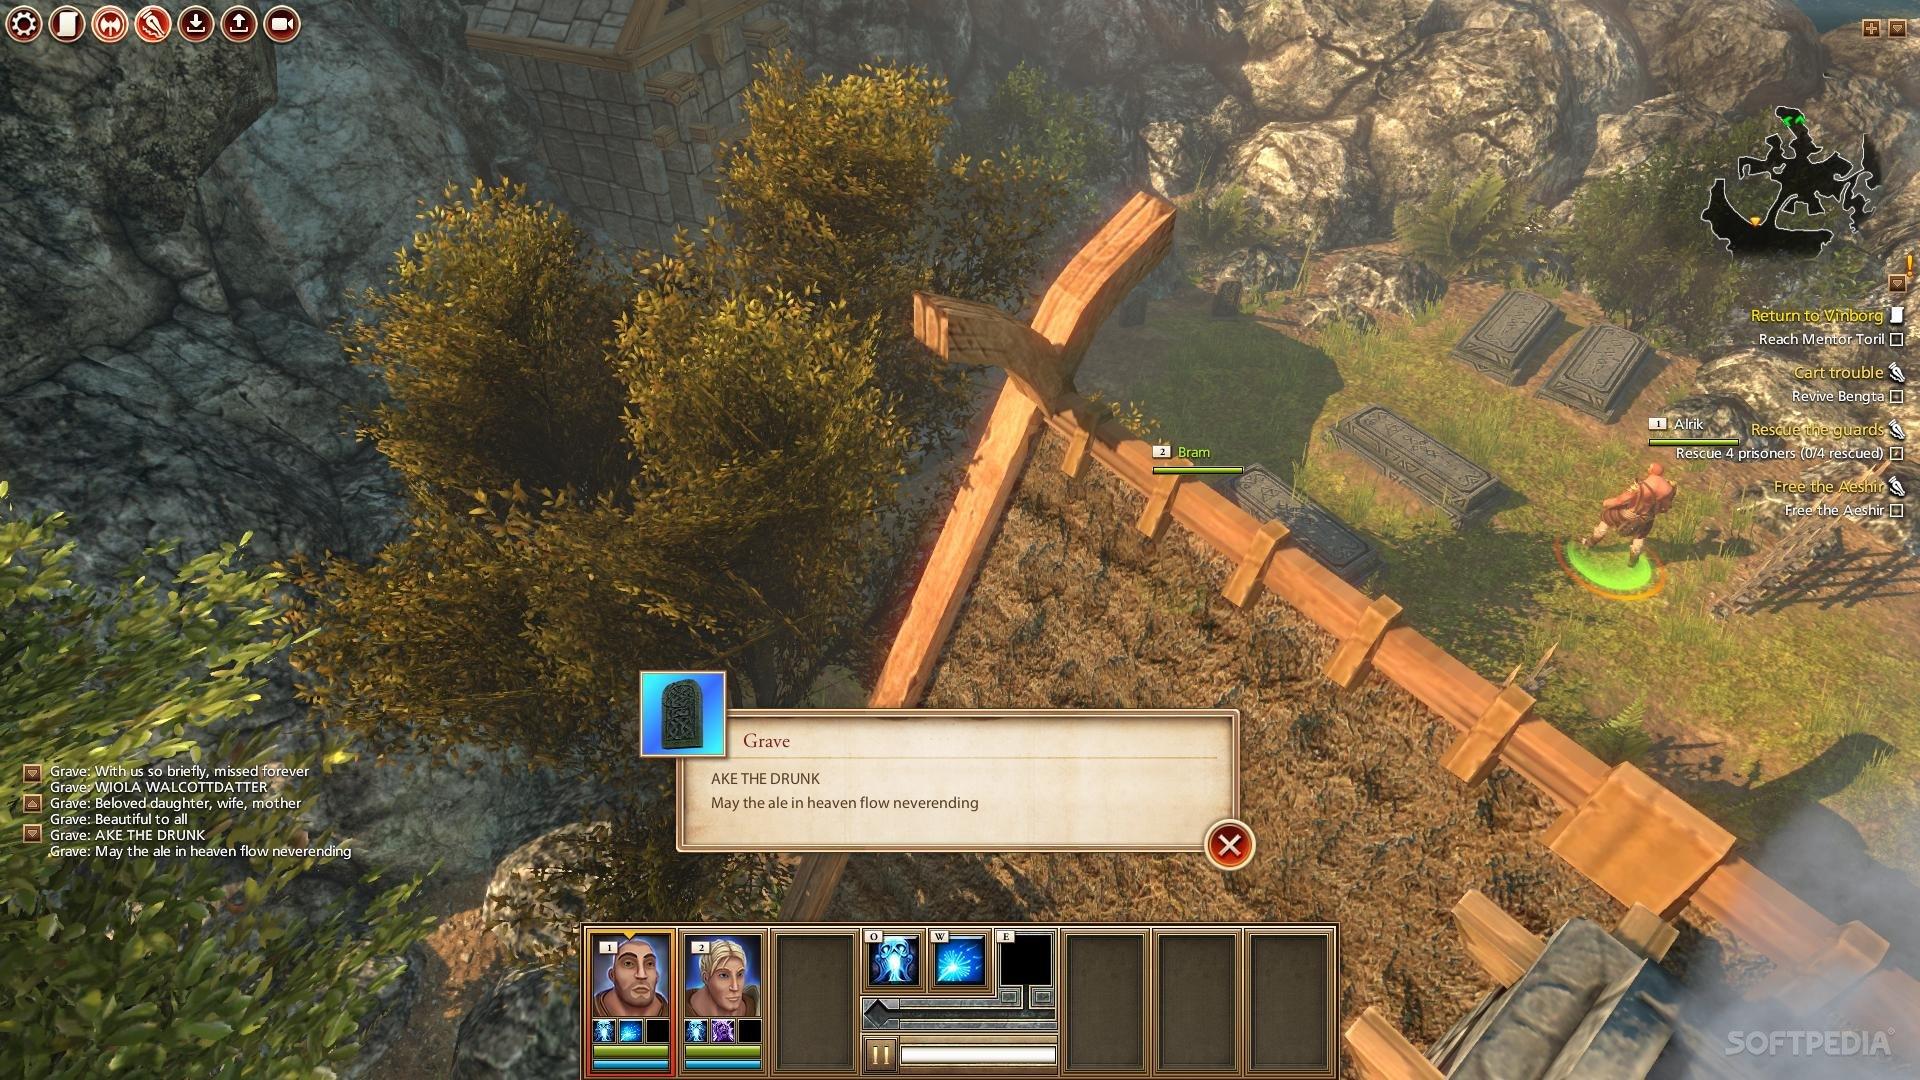 Kyn Screenshot 2